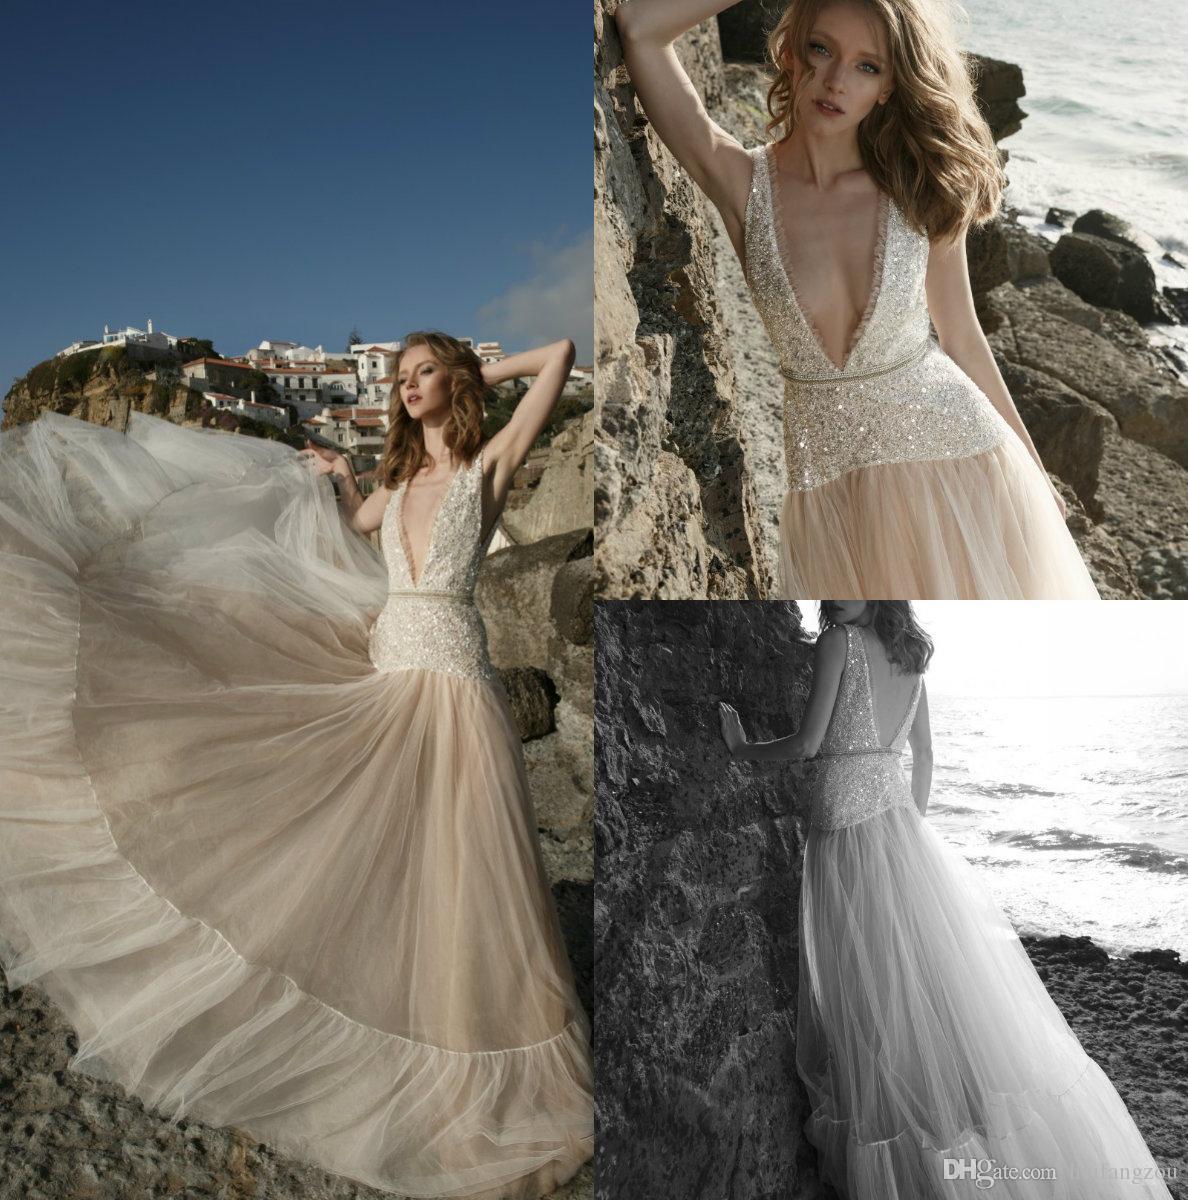 ad731ae99f42c Wedding Dresses From China Free Shipping - raveitsafe